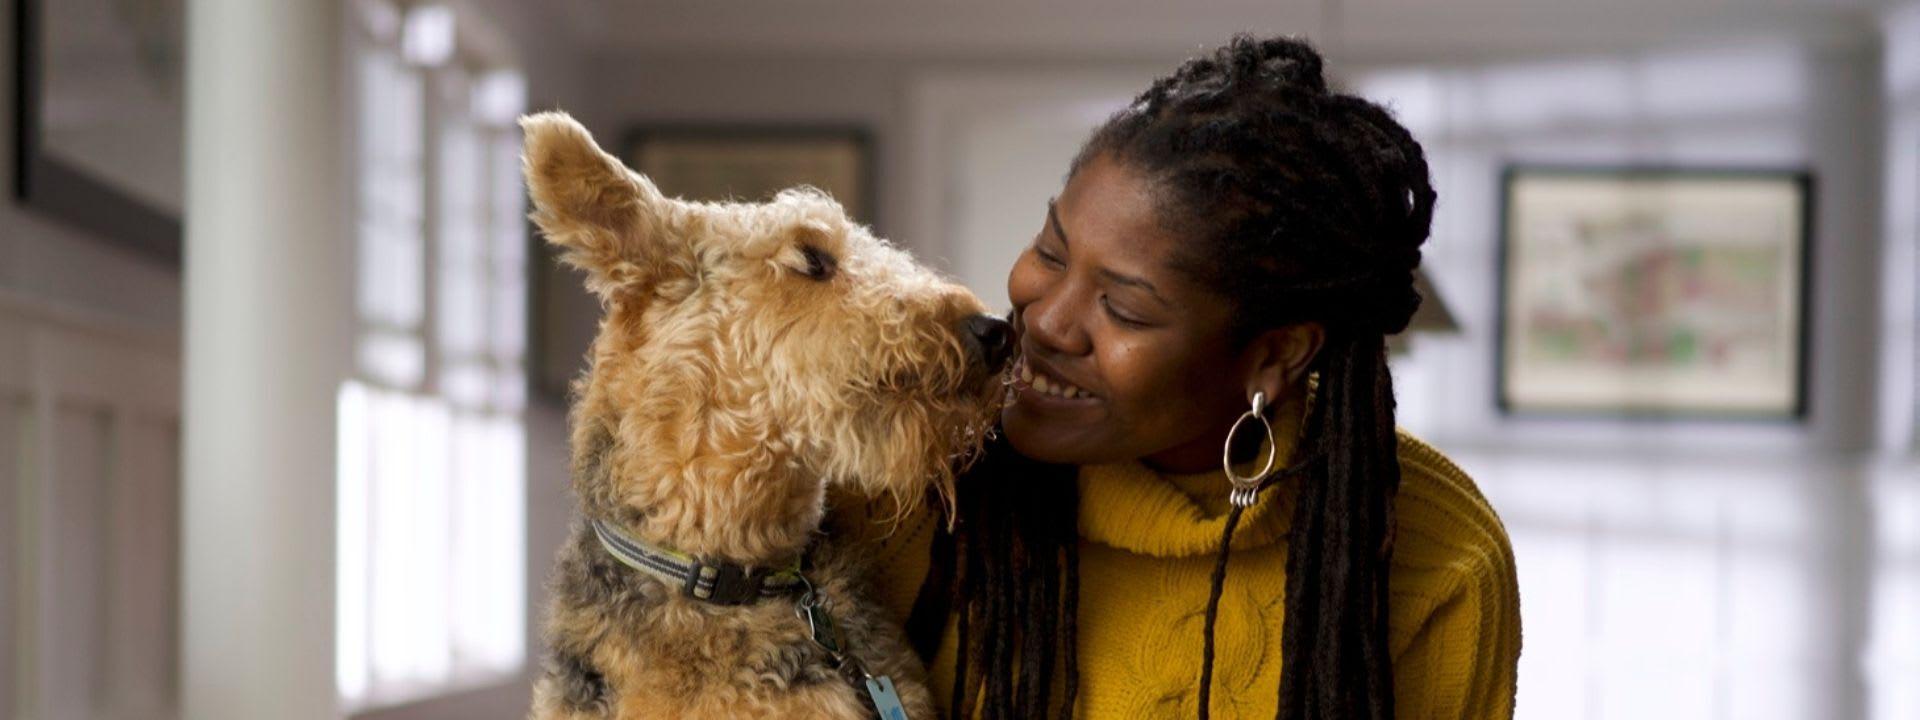 Dog Love Languages